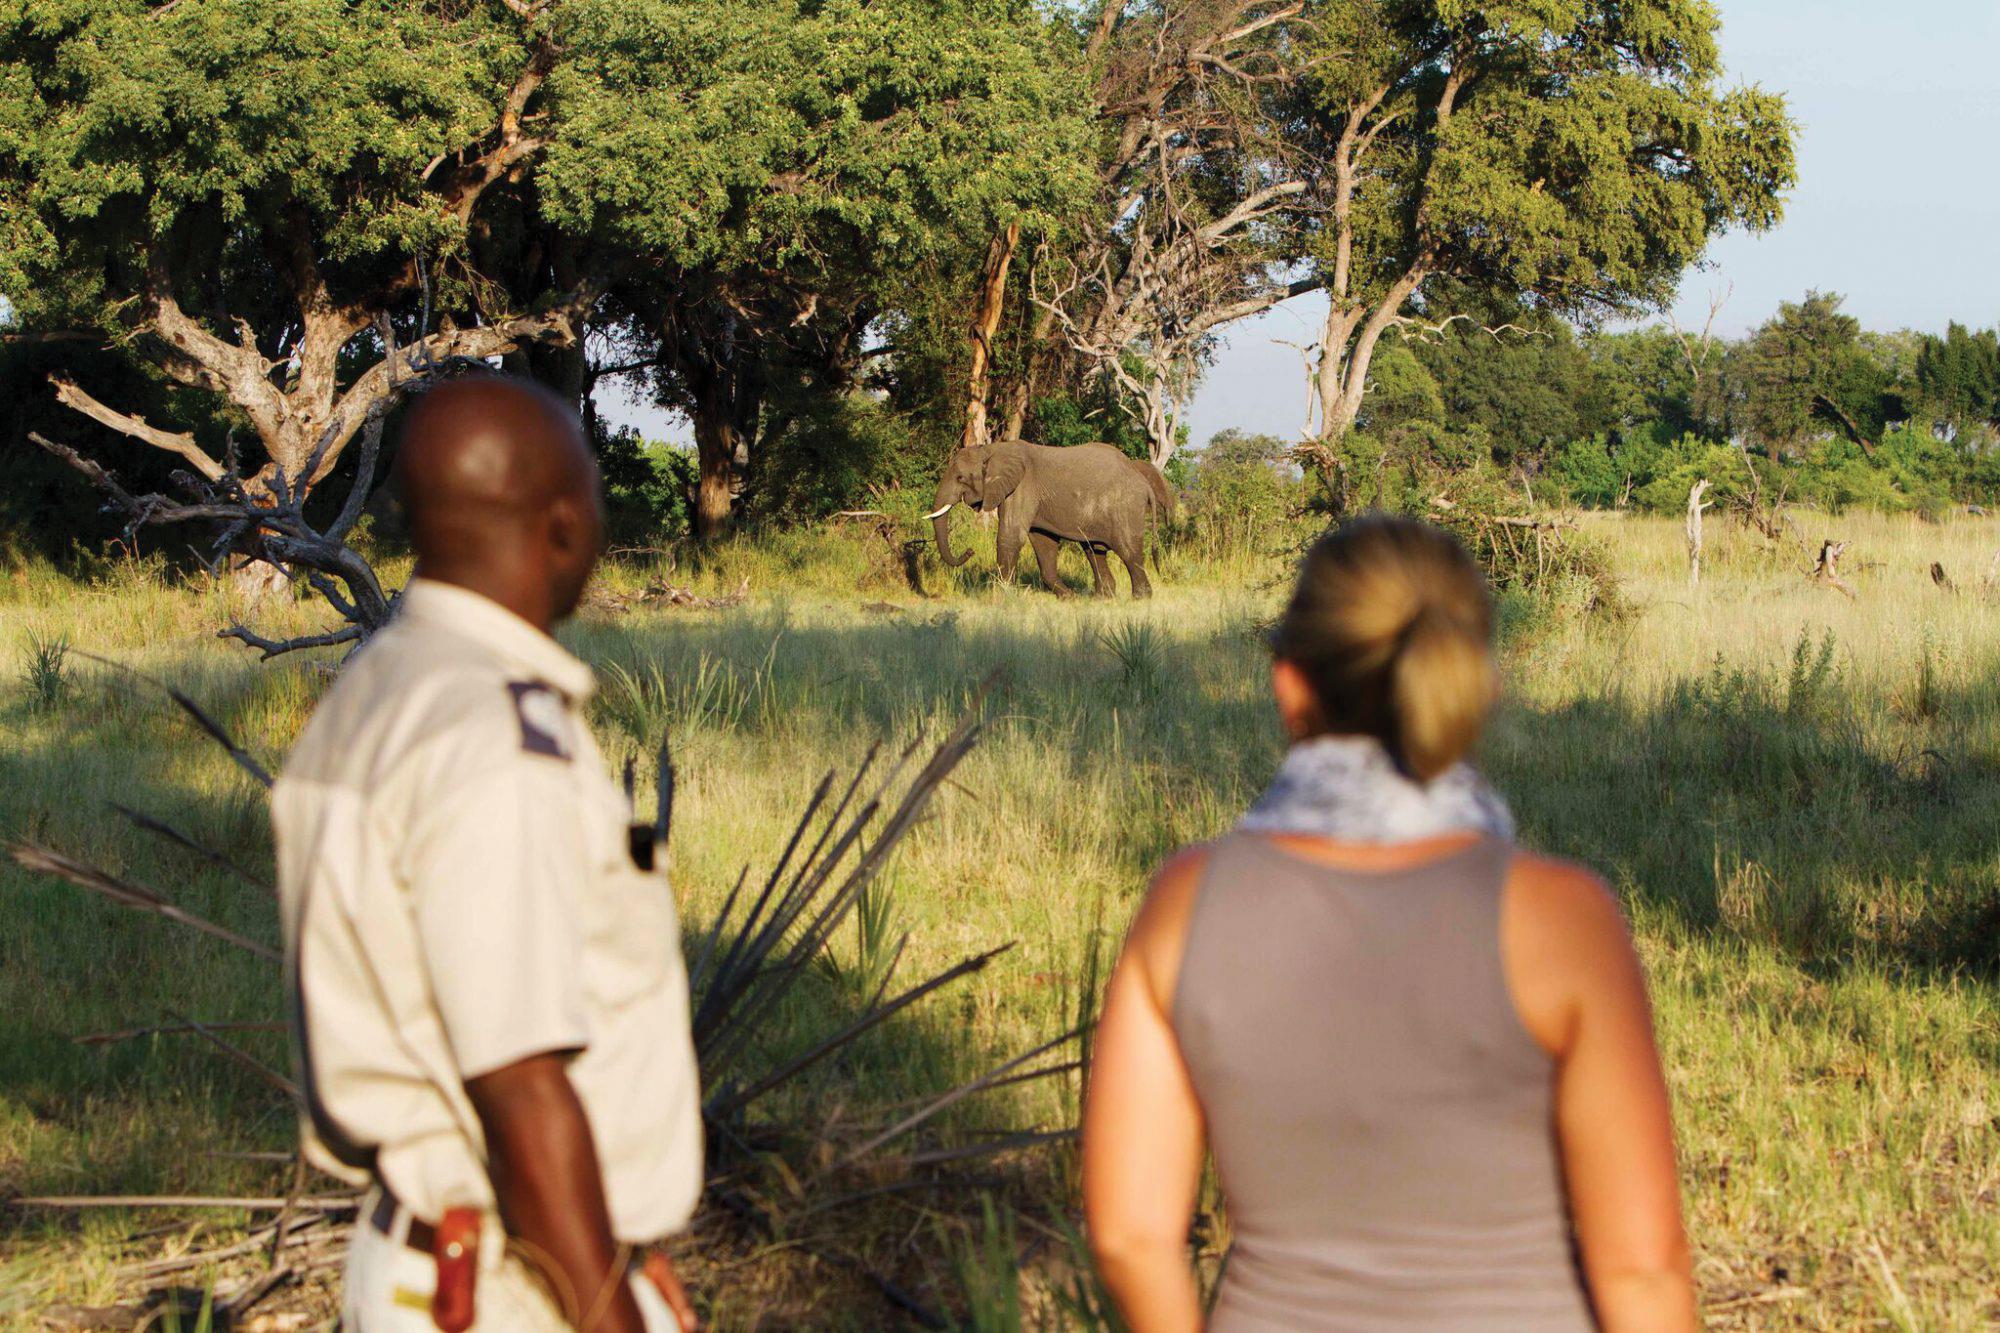 elephant runs between the trees on safari in botswana